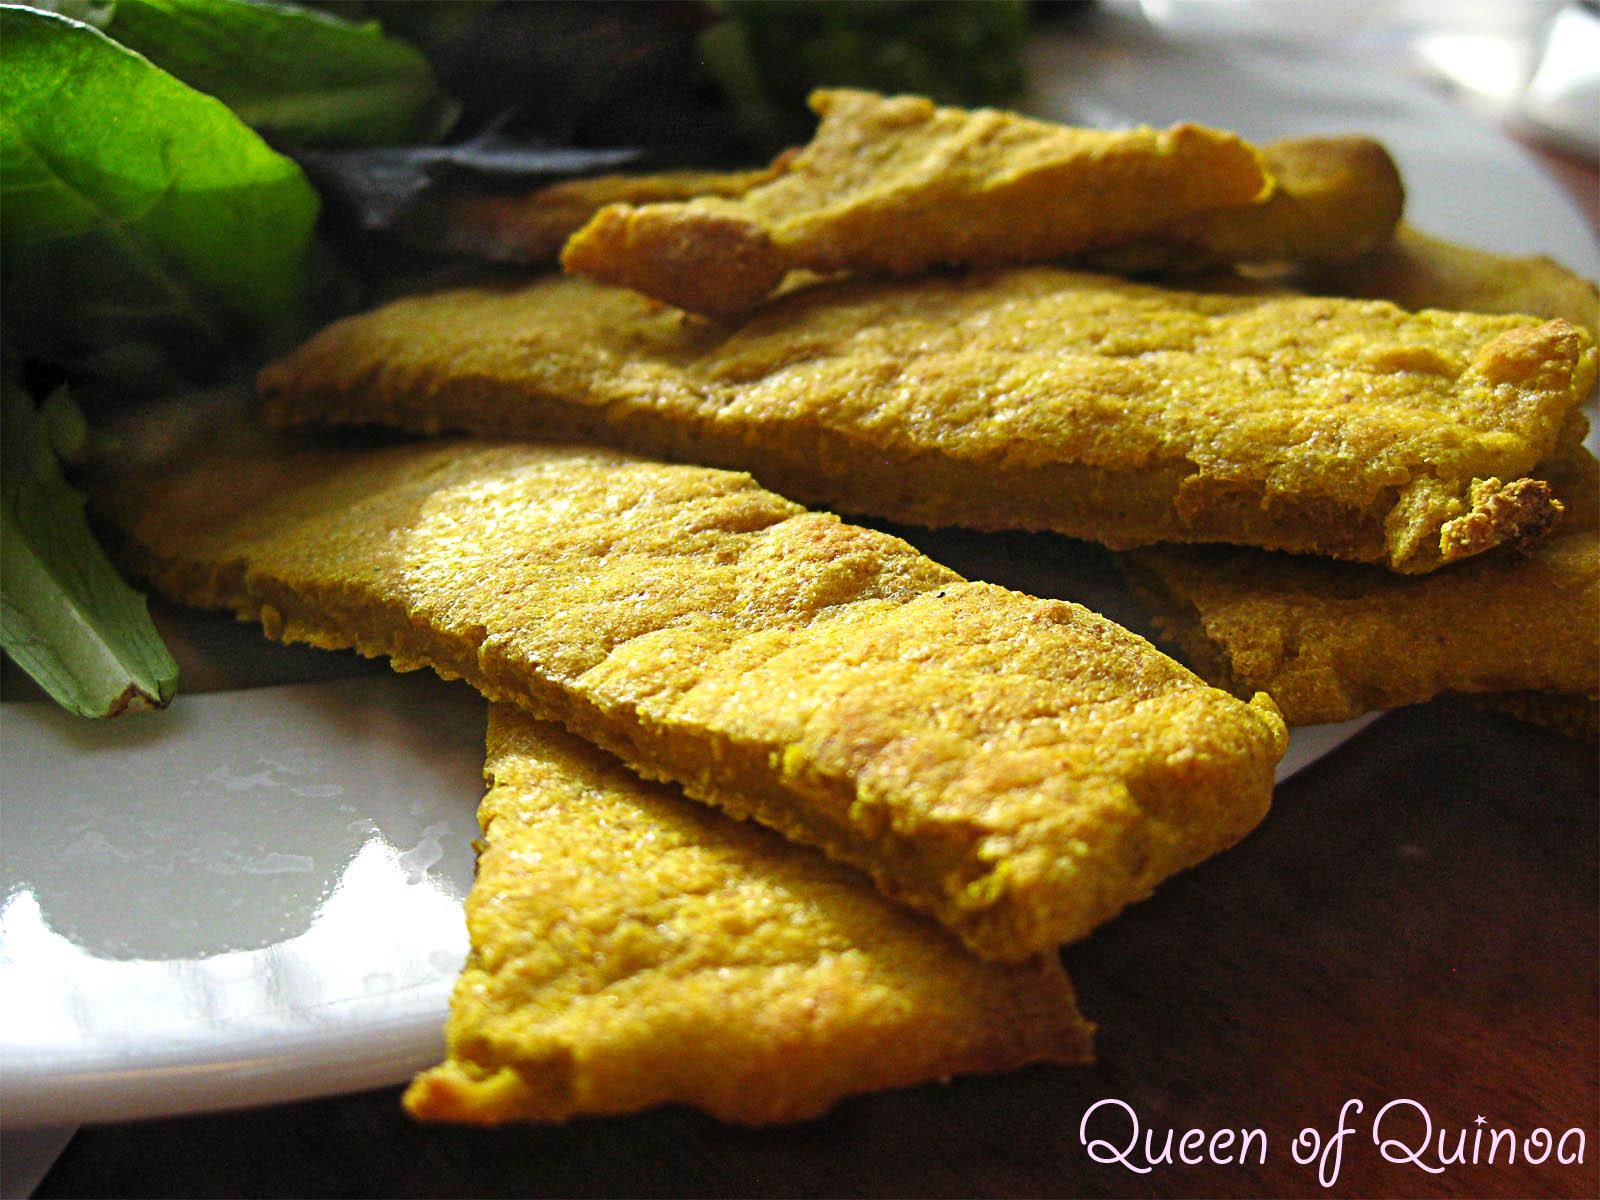 Curried Cauliflower & Squash Soup with Quinoa Flatbread